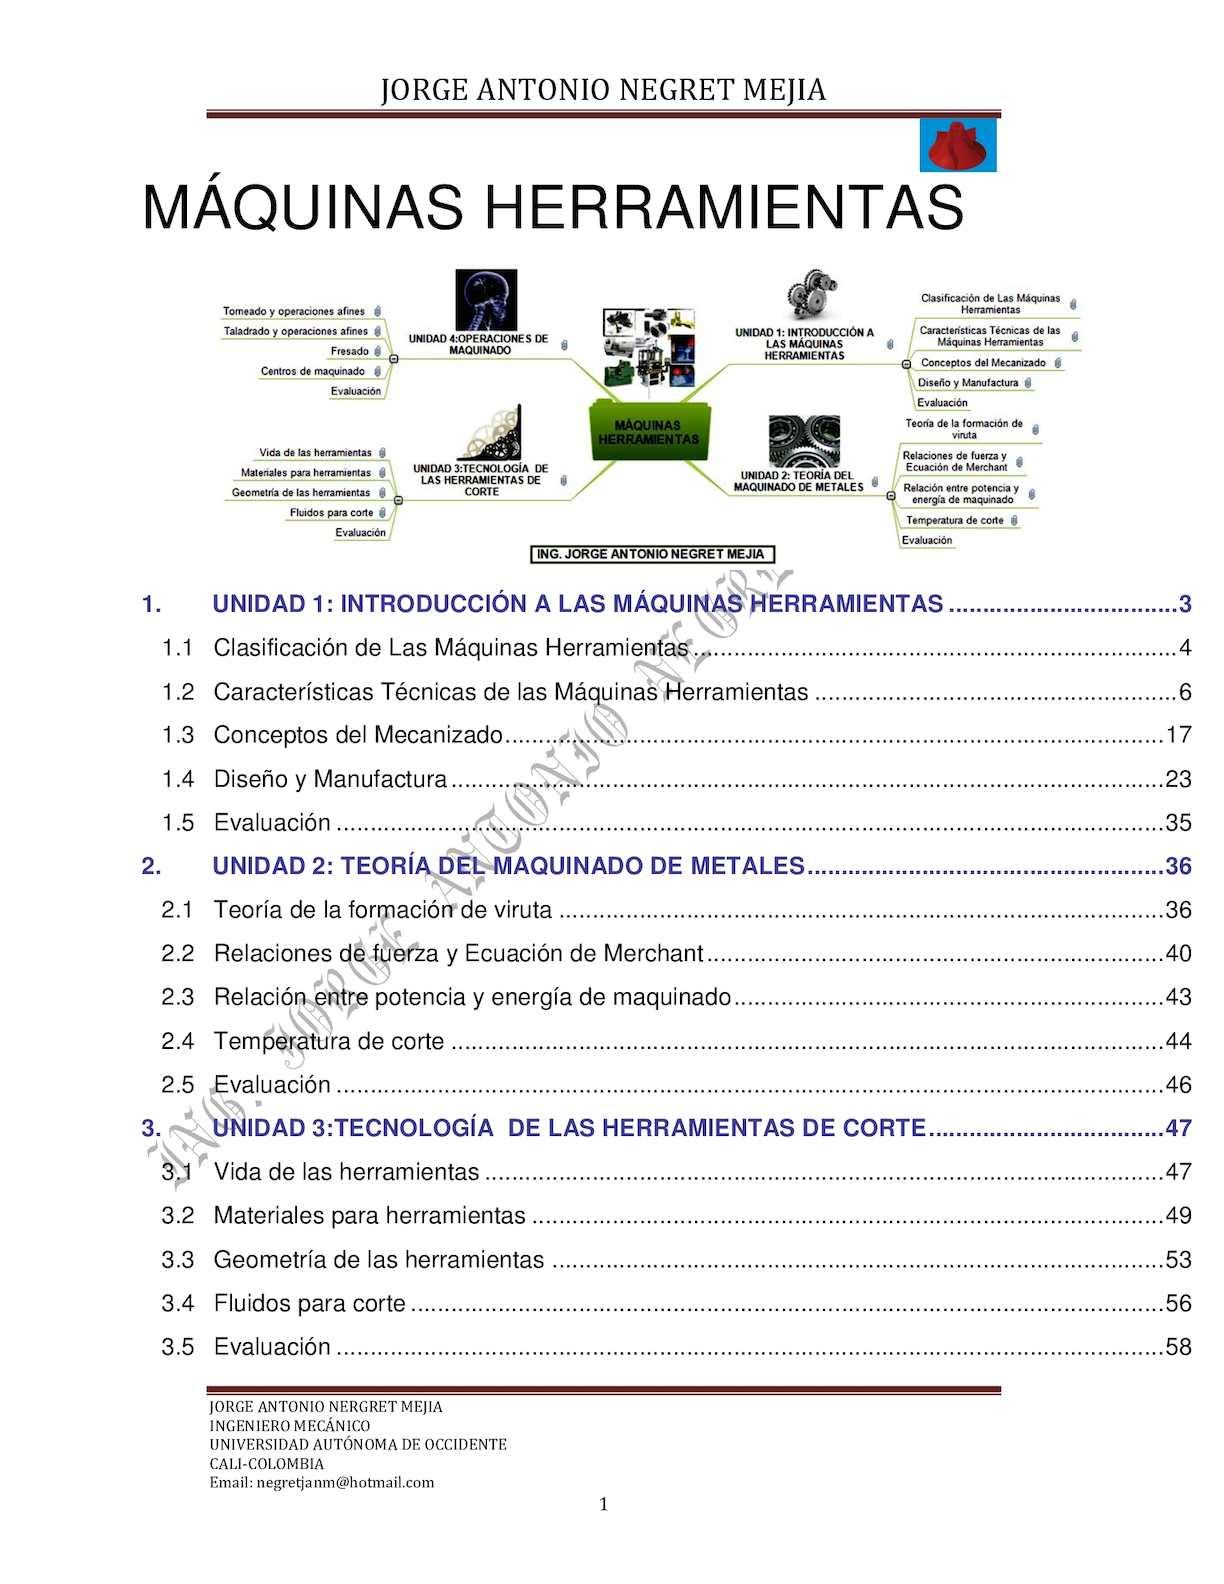 Calaméo - Máquinas Herramientas  Jorge Antonio Negret Mejía 303933646027